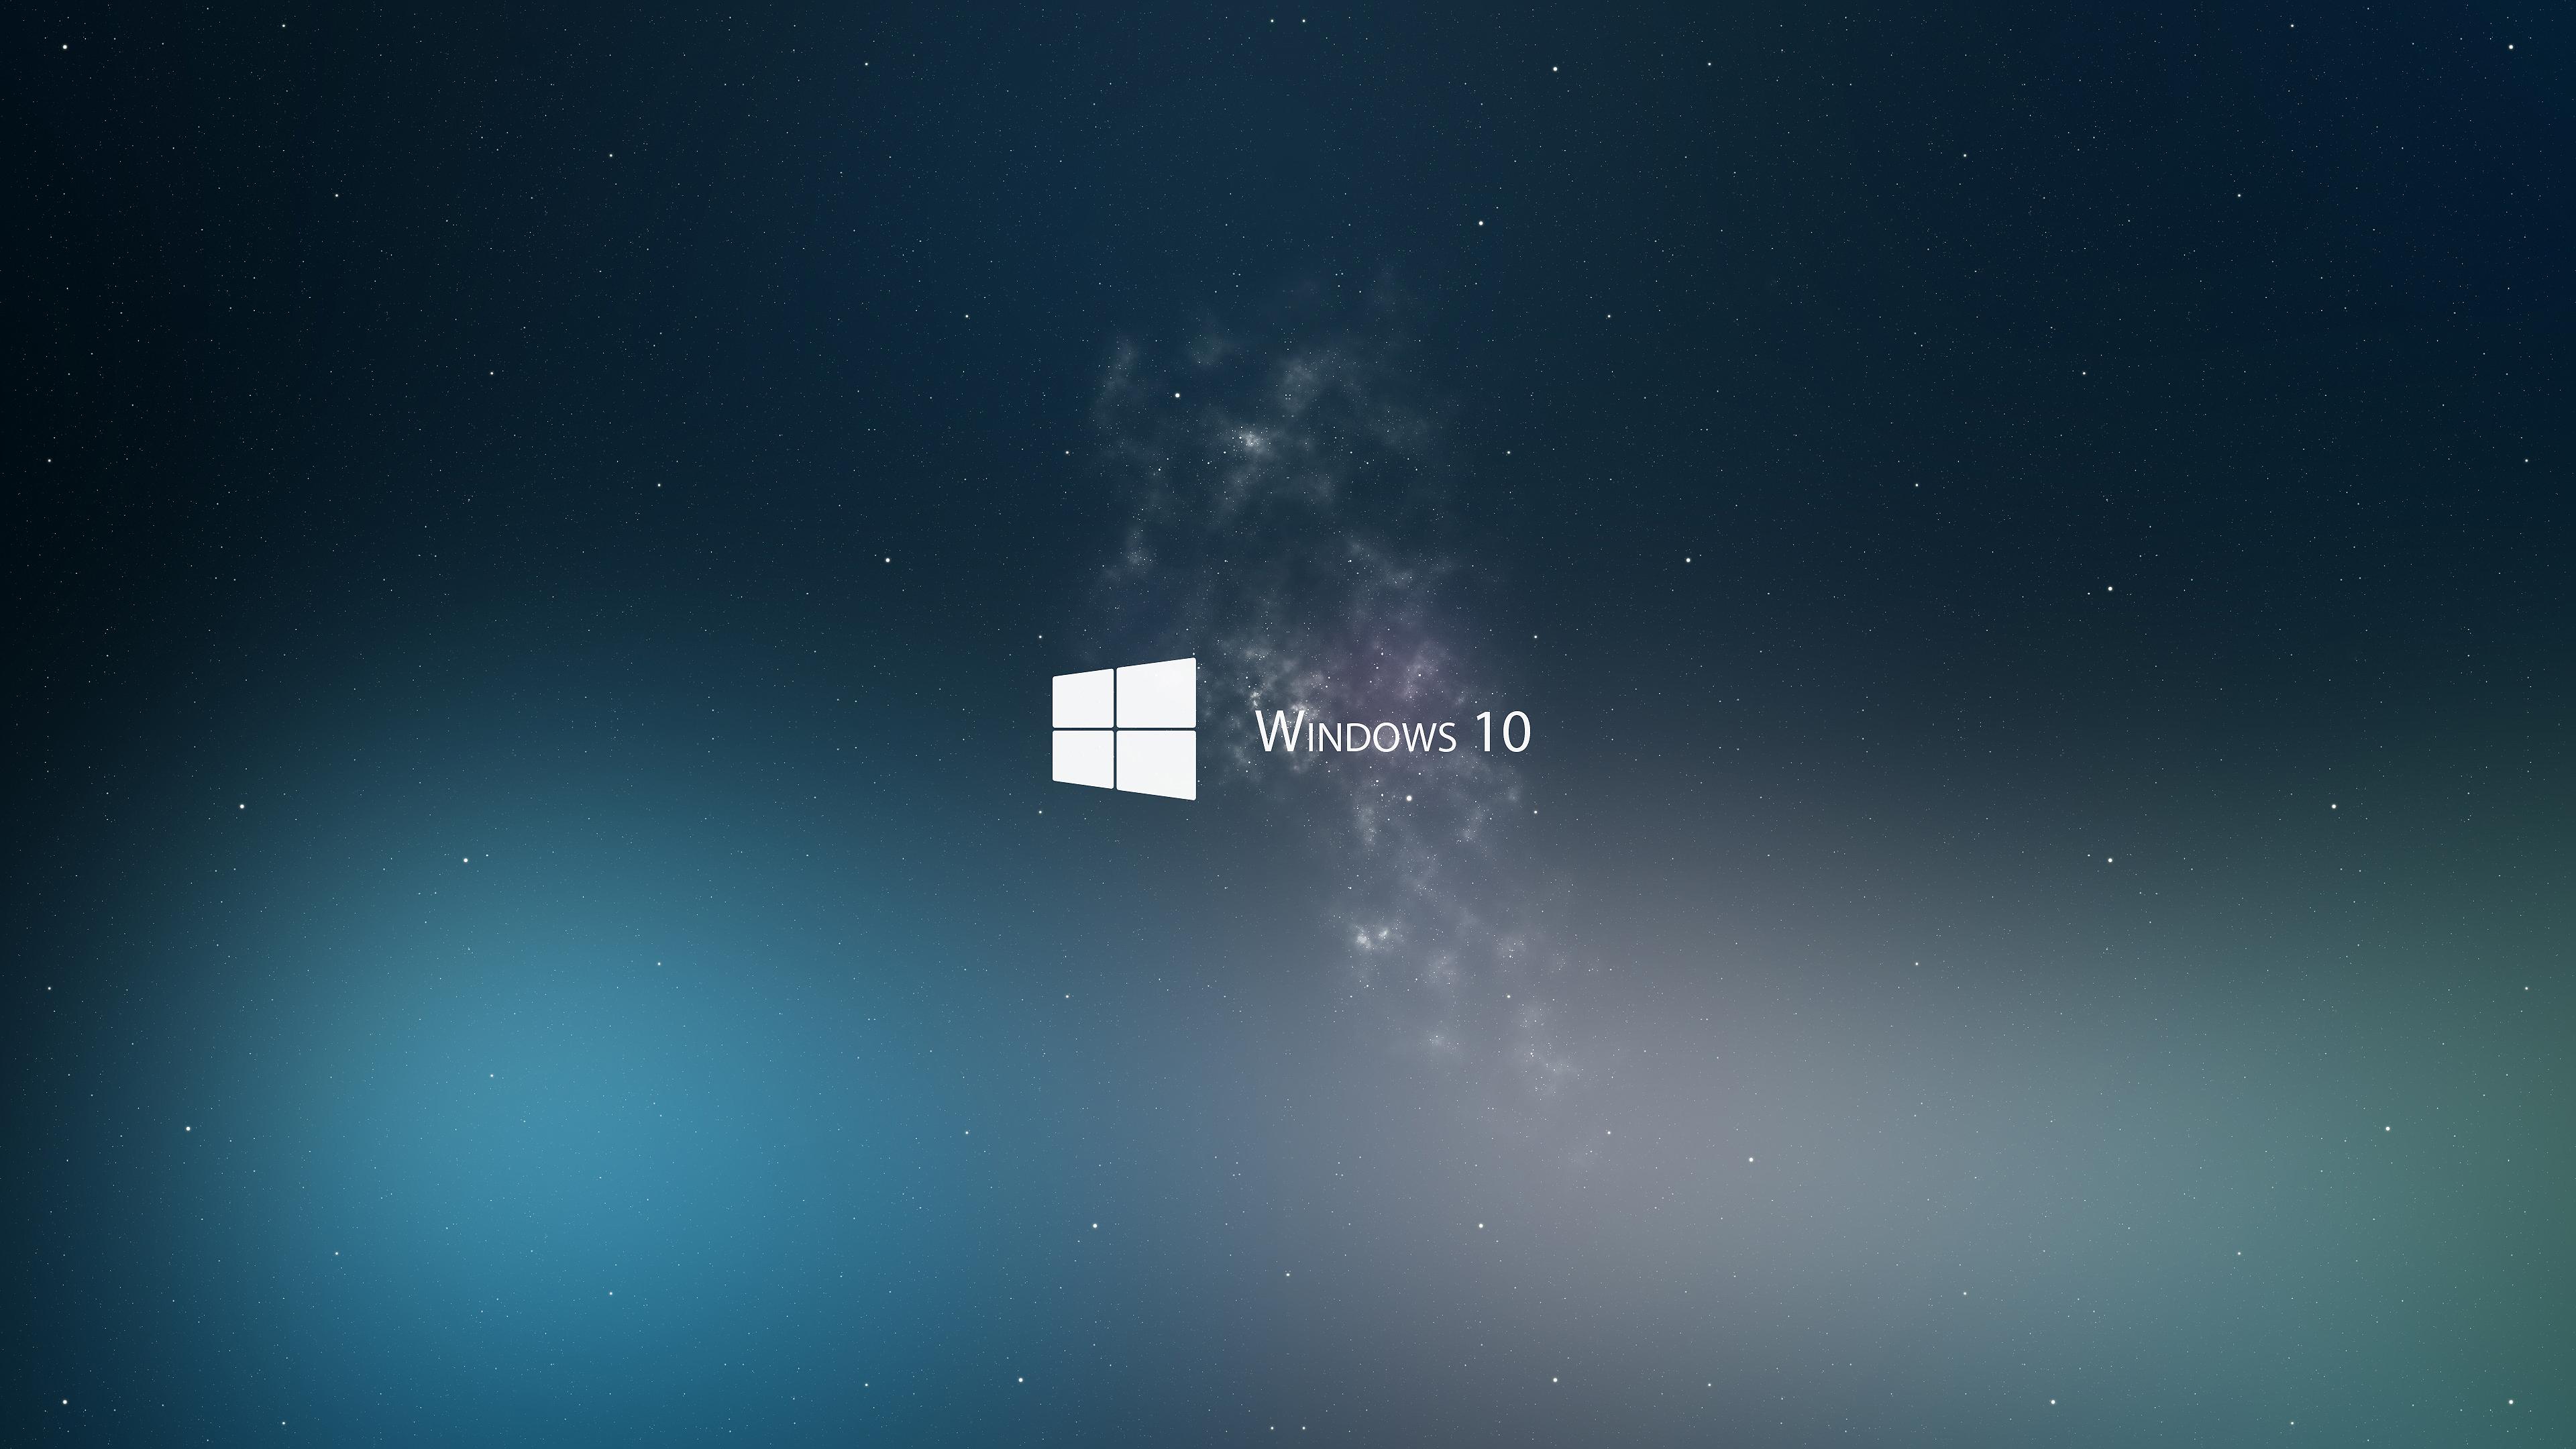 Live Wallpapers For Windows 10 Wallpapersafari